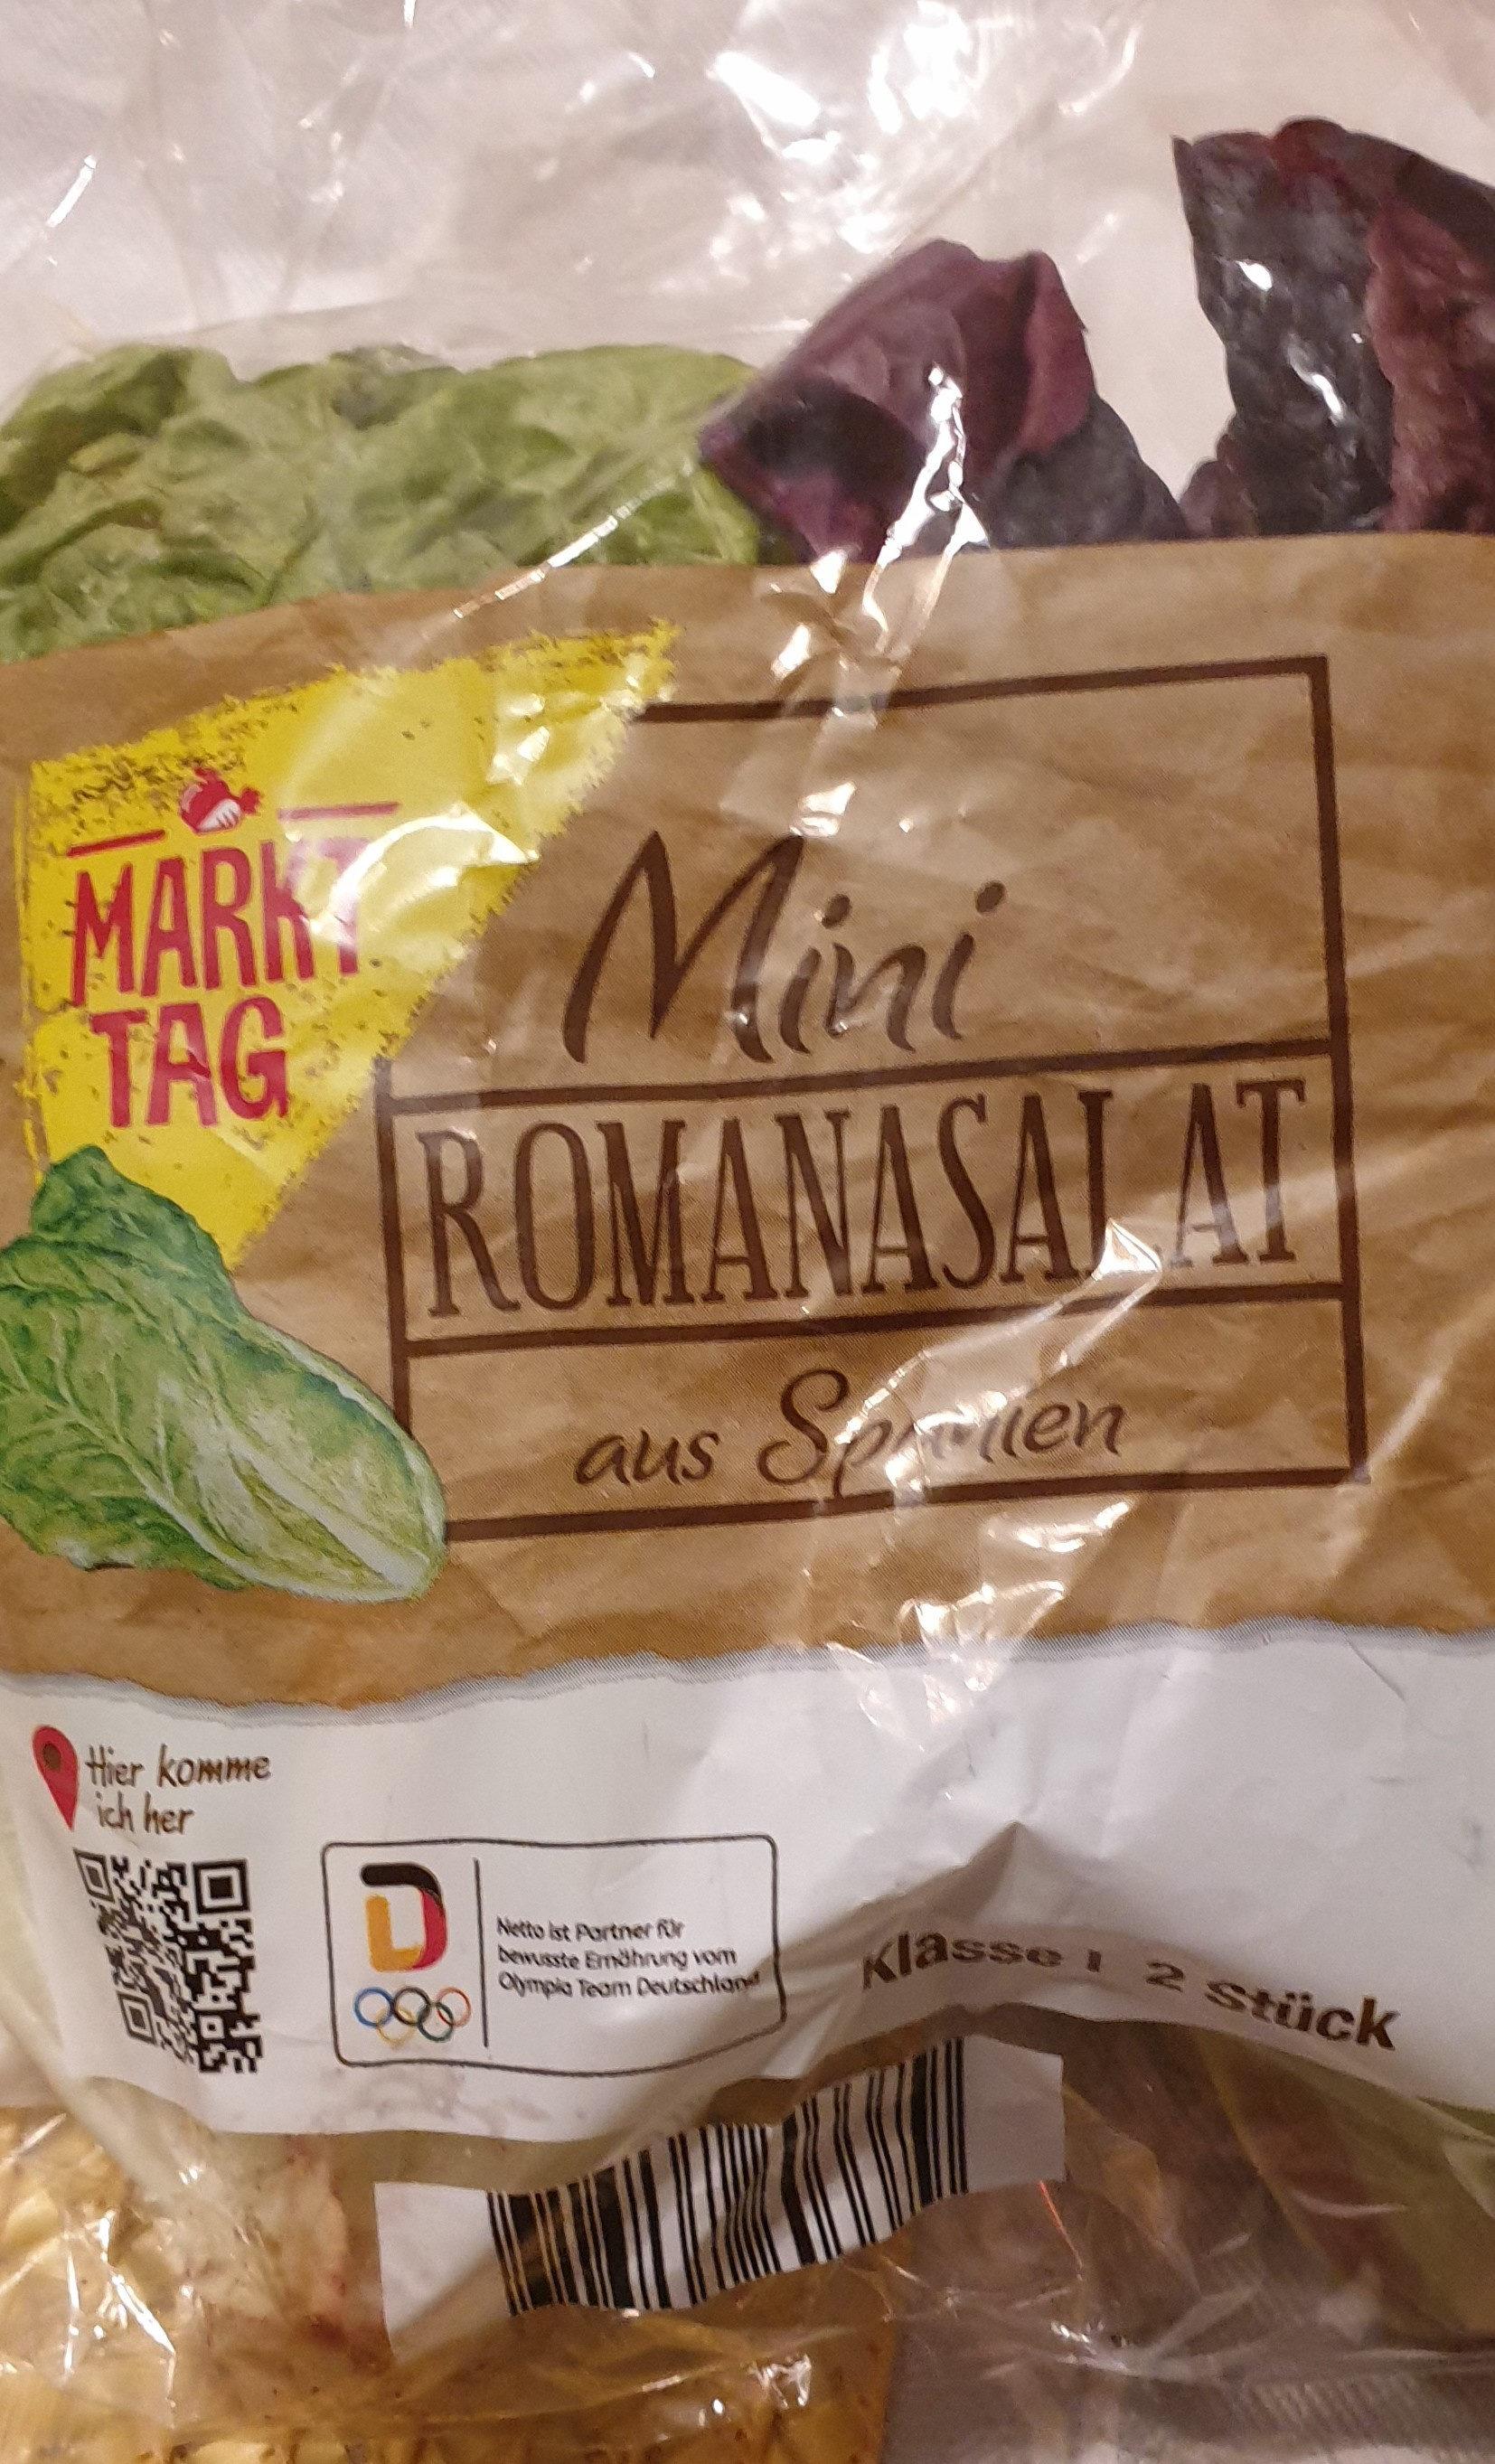 Mini Romanasalat - Produit - de